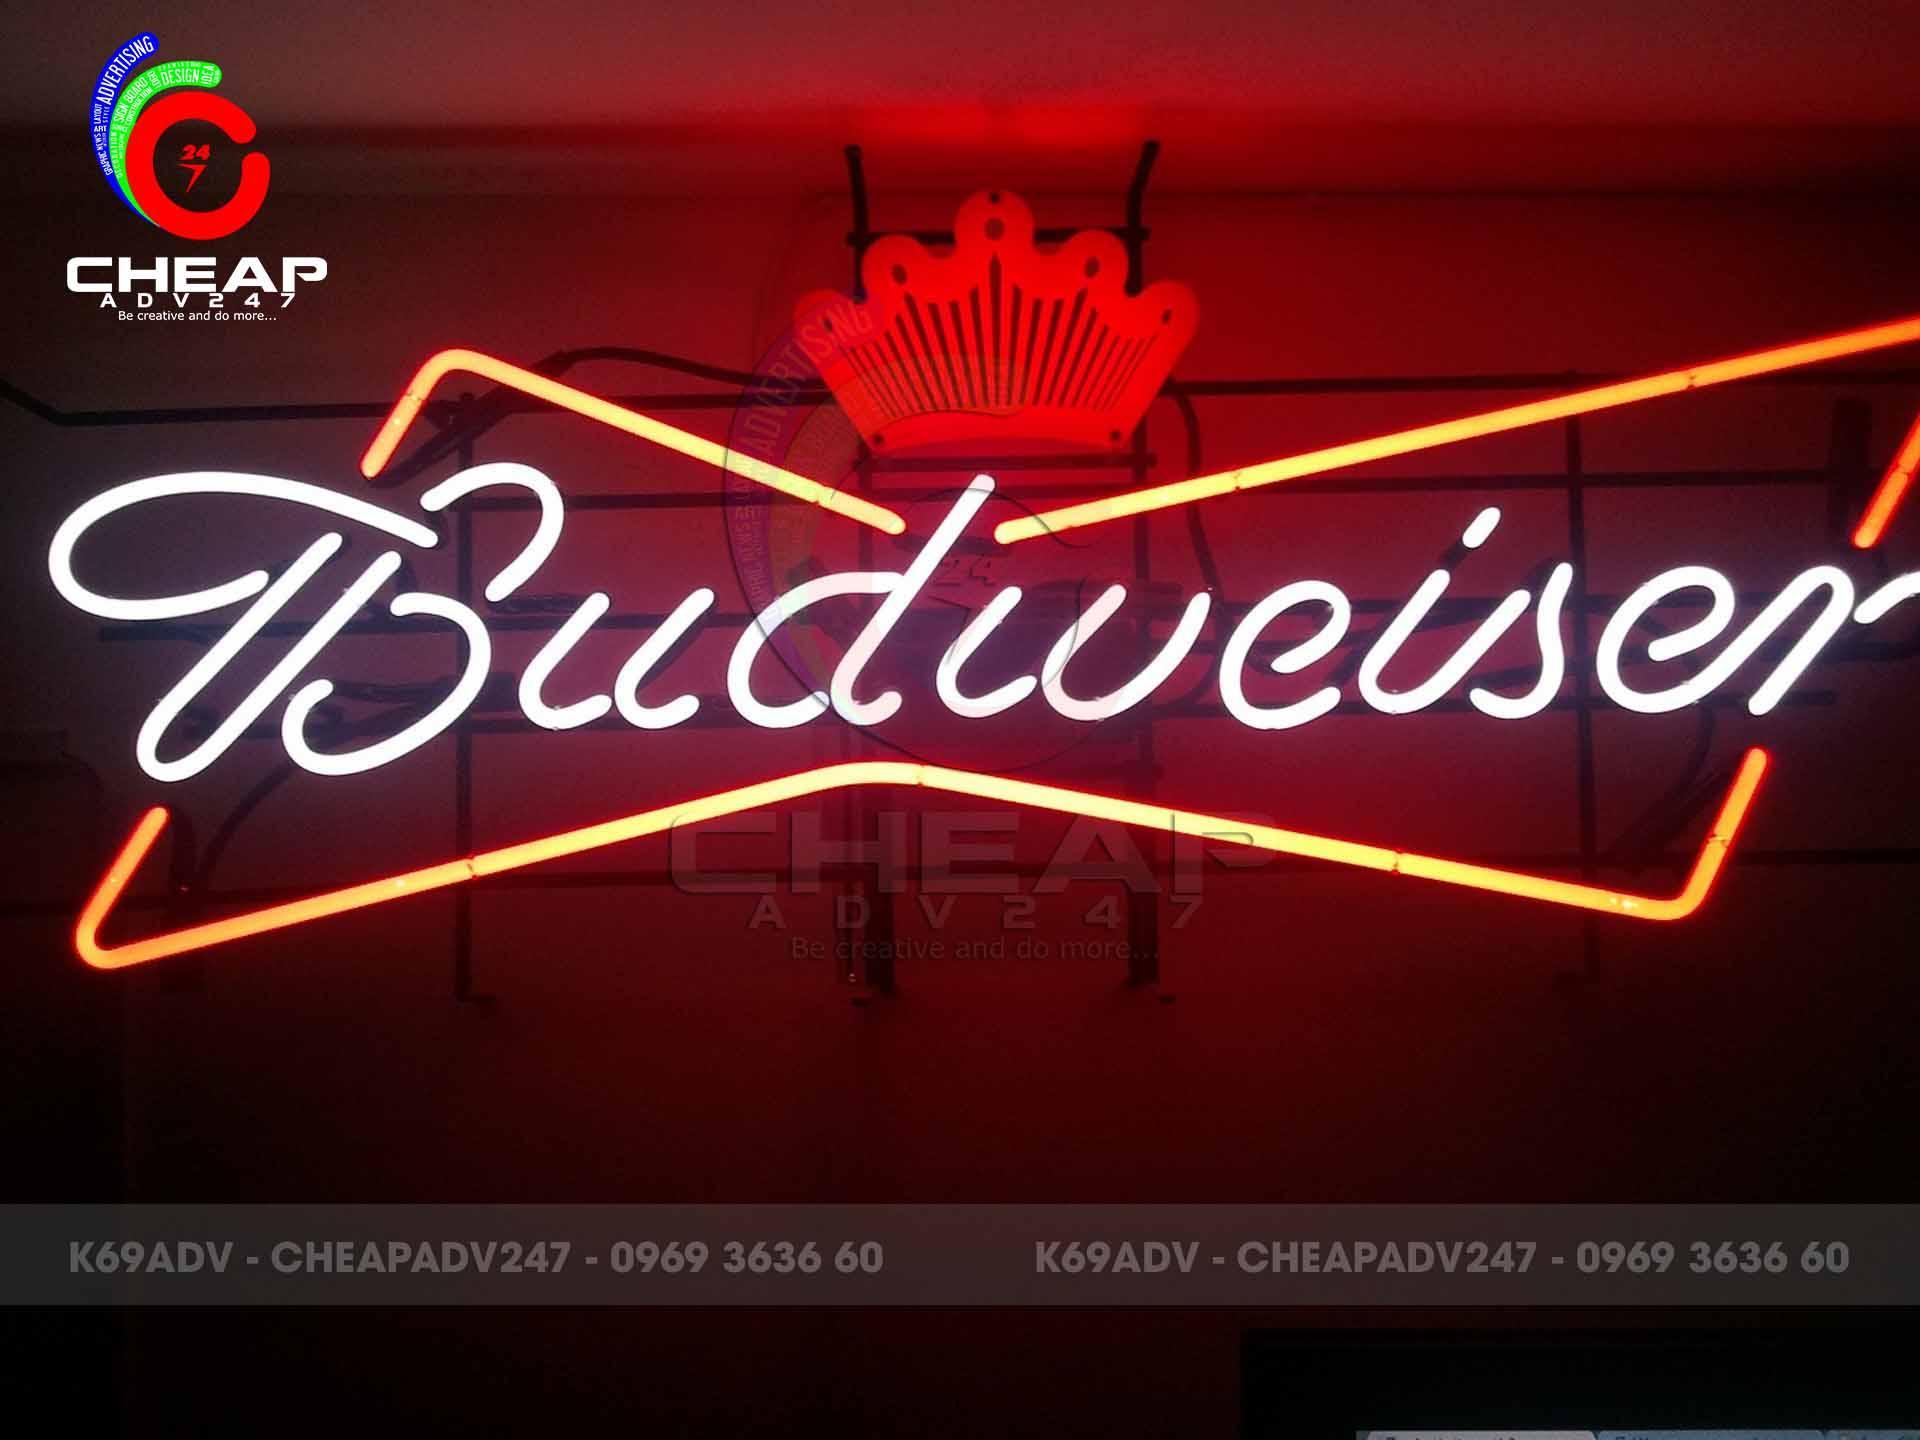 mẫu đèn neon sign quán cafe quận 1